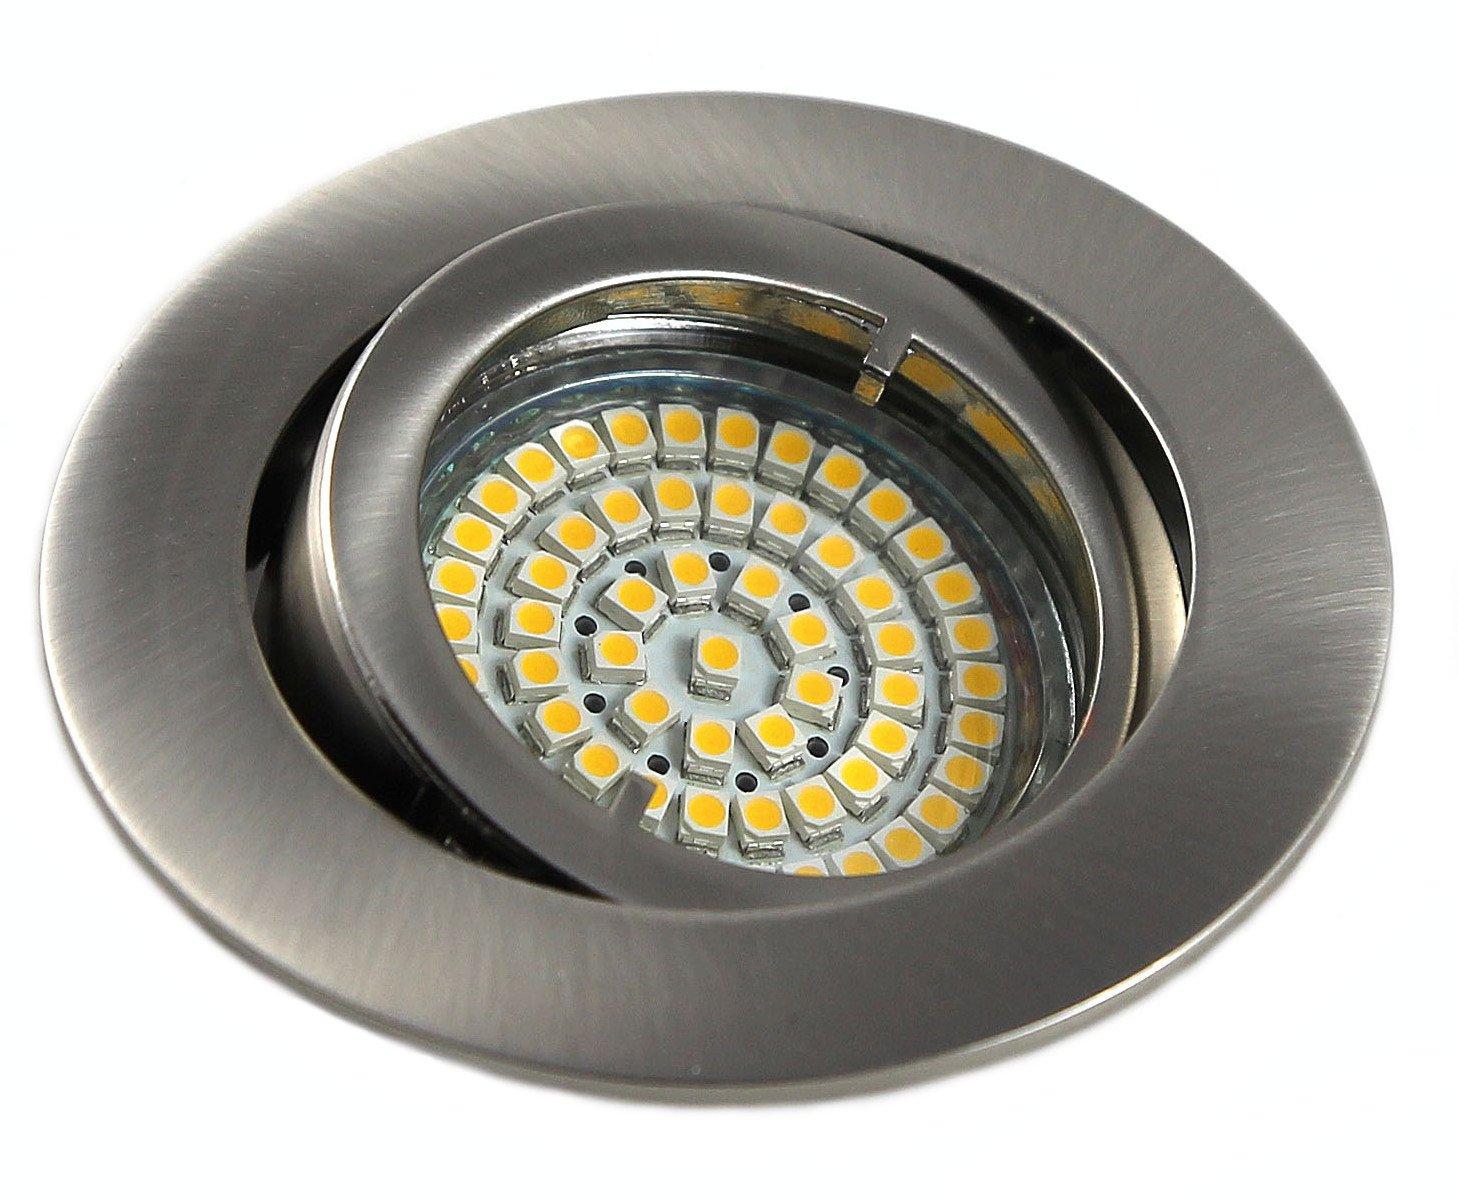 10er Set 230Volt LED SMD Einbaustrahler Lino. Spot in Farbe: Edelstahl gebürstet inkl. GU10 60er SMD Leuchtmittel Lichtfarbe: Kaltweiß 6000K + Fassung 3Watt = 25Watt .Downlights [Energieklasse A+]